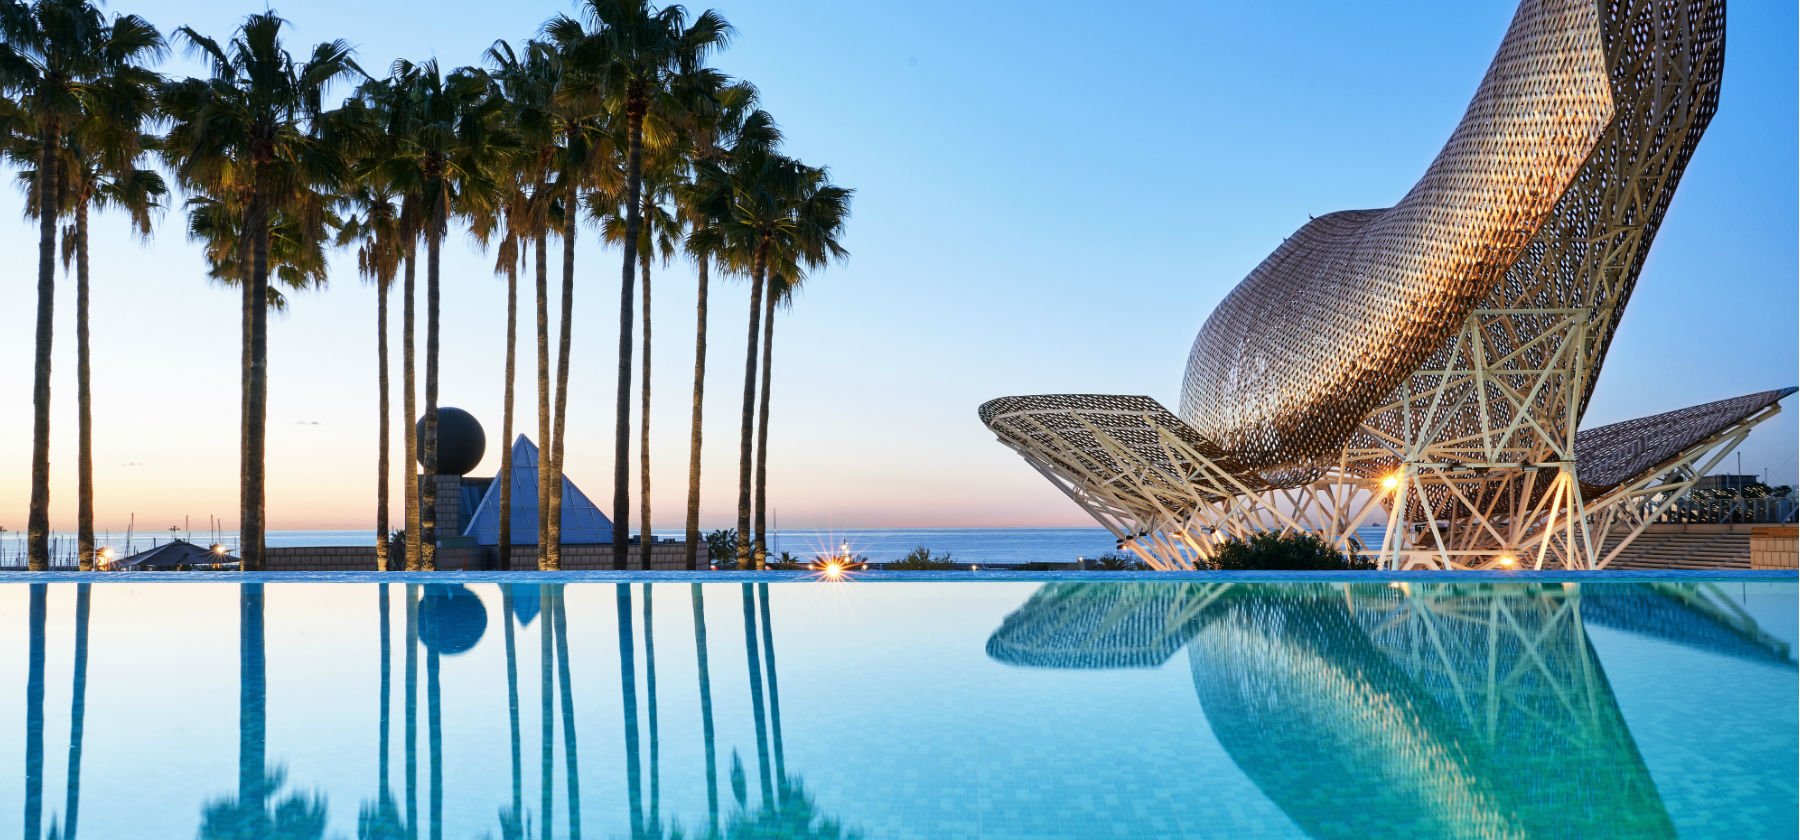 Pool, Skulptur und Meerausblick des Hotel Arts Barcelona